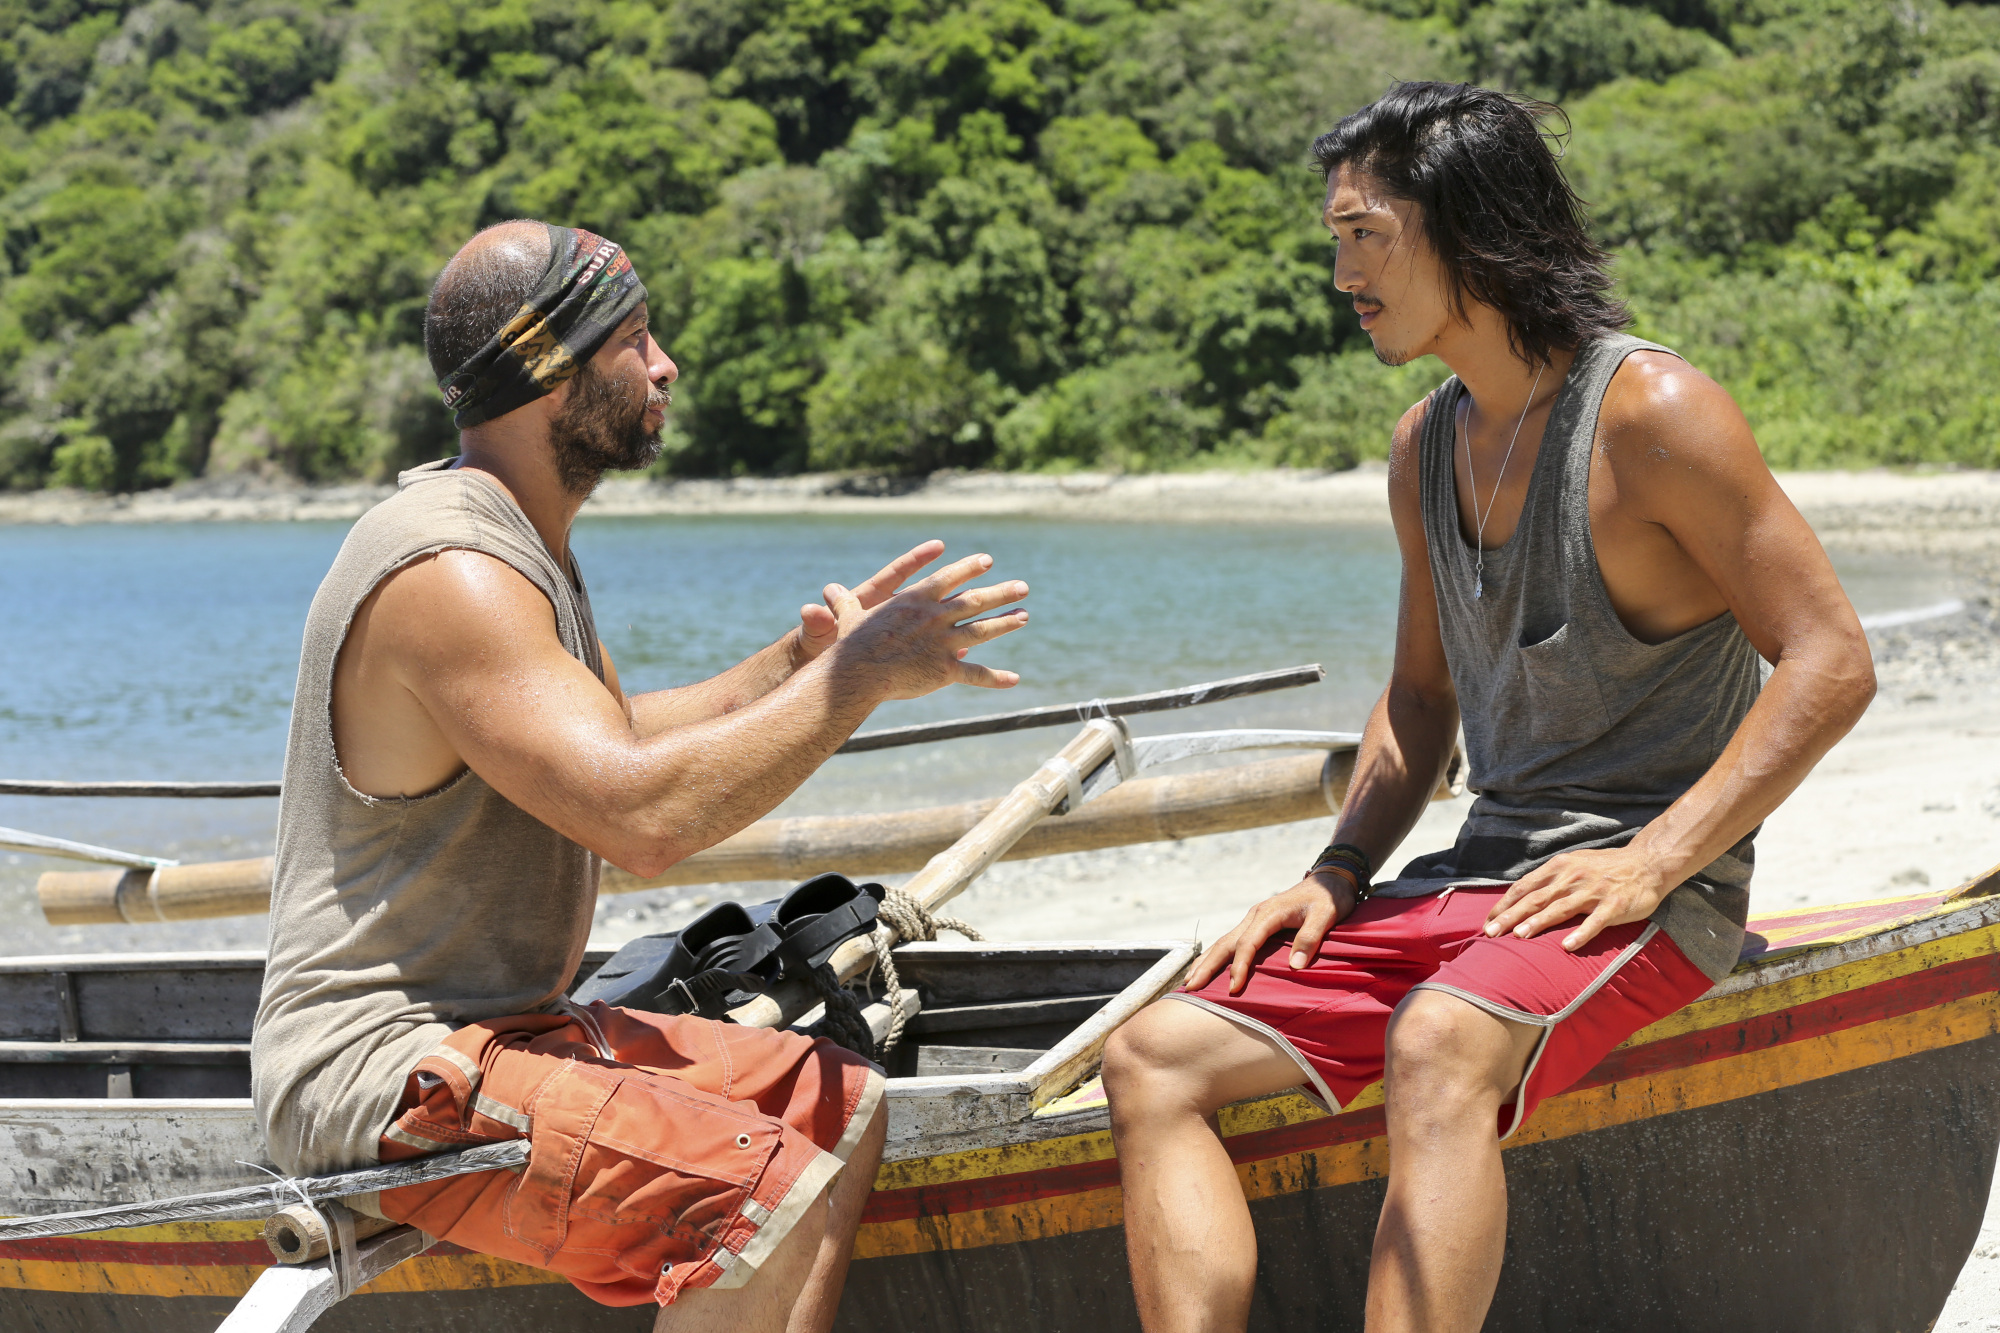 Tony and Woo in Season 28 Episode 8